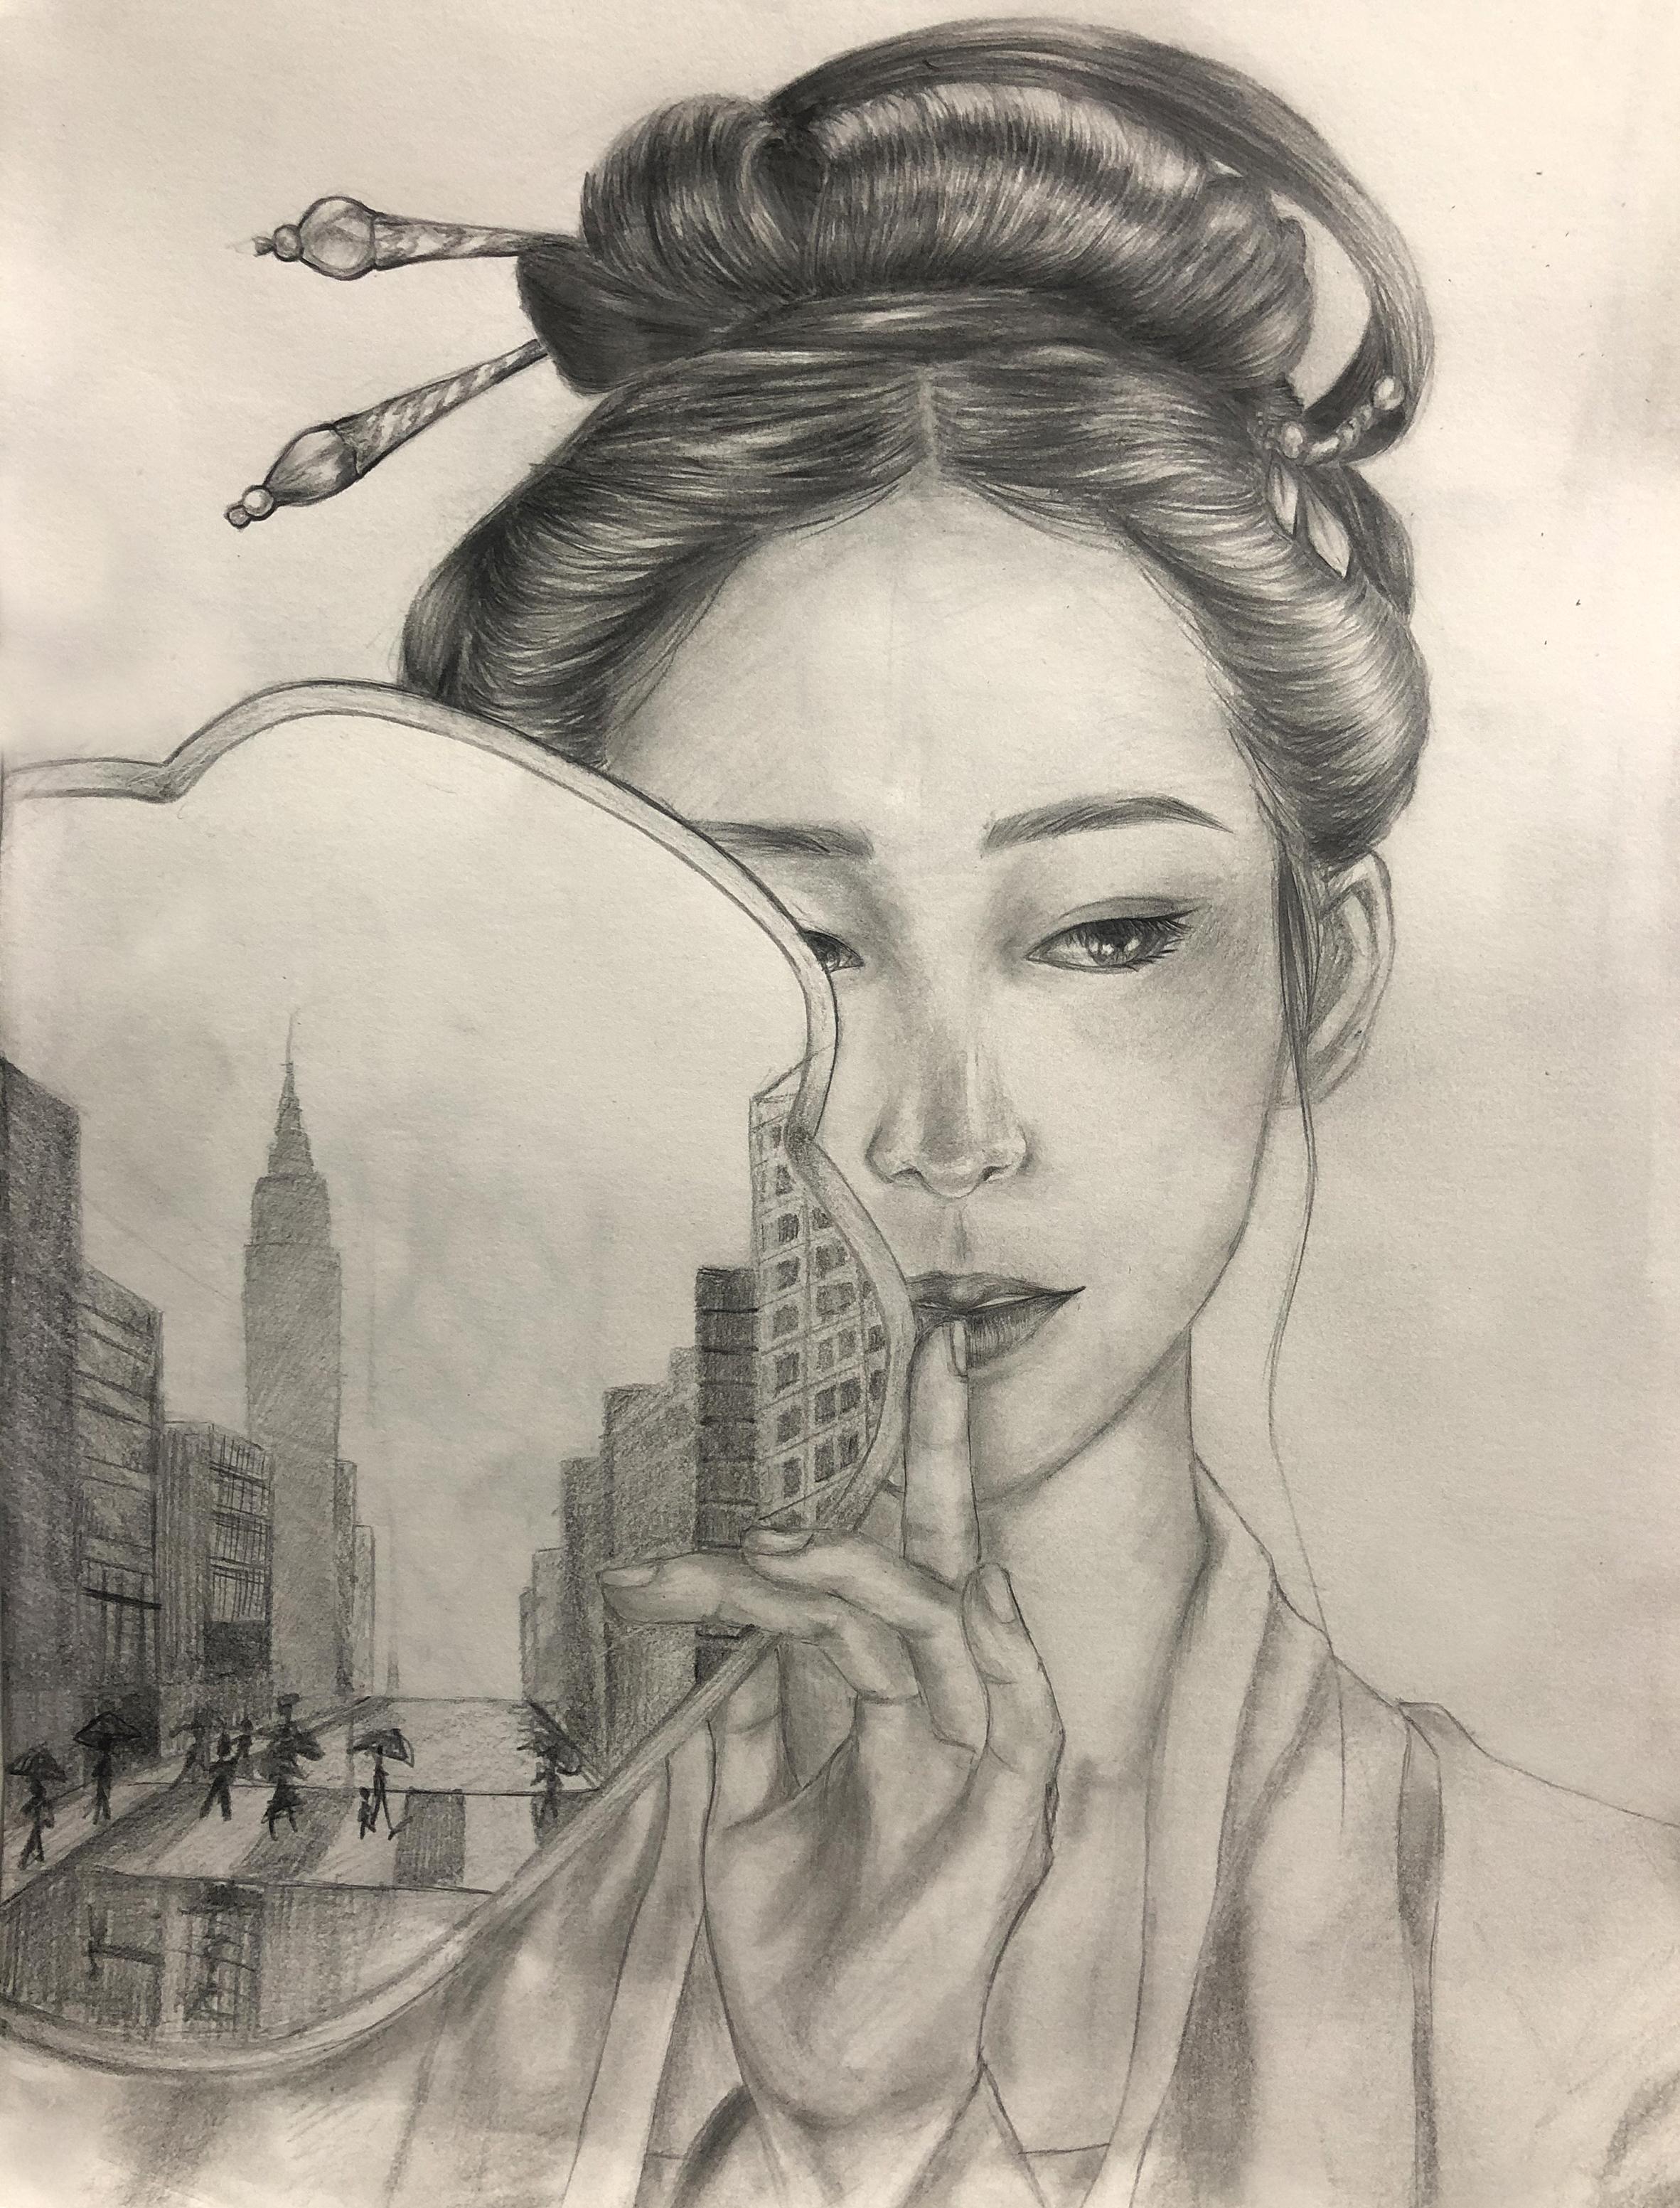 Student: Yufei L.